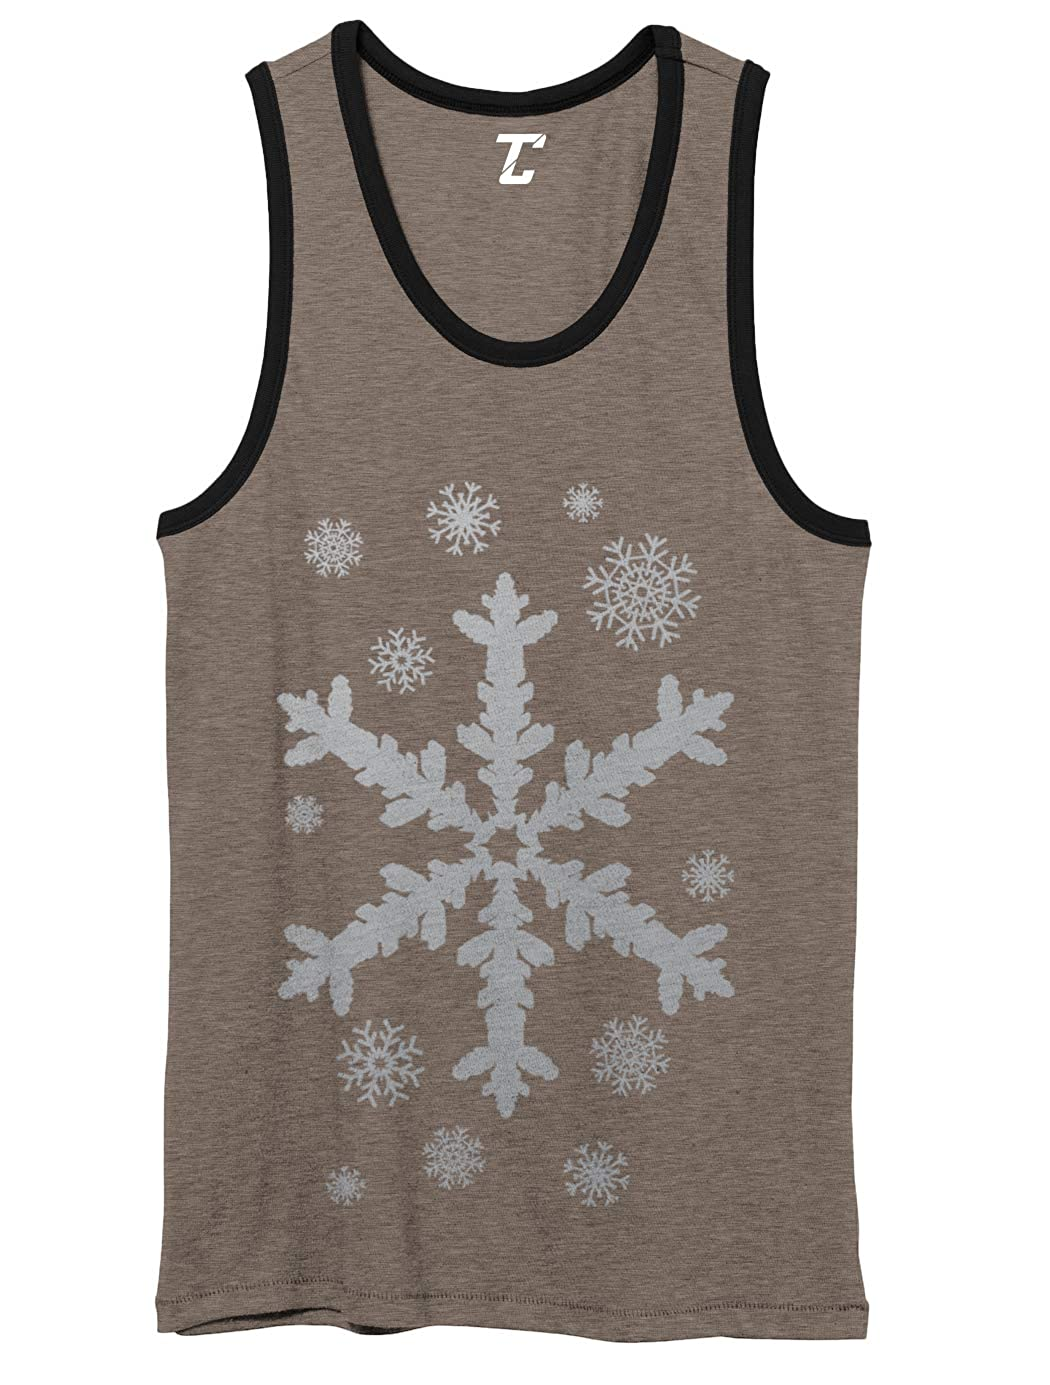 Xmas Christmas Unisex 2-Tone Tank Top Silver Snowflakes